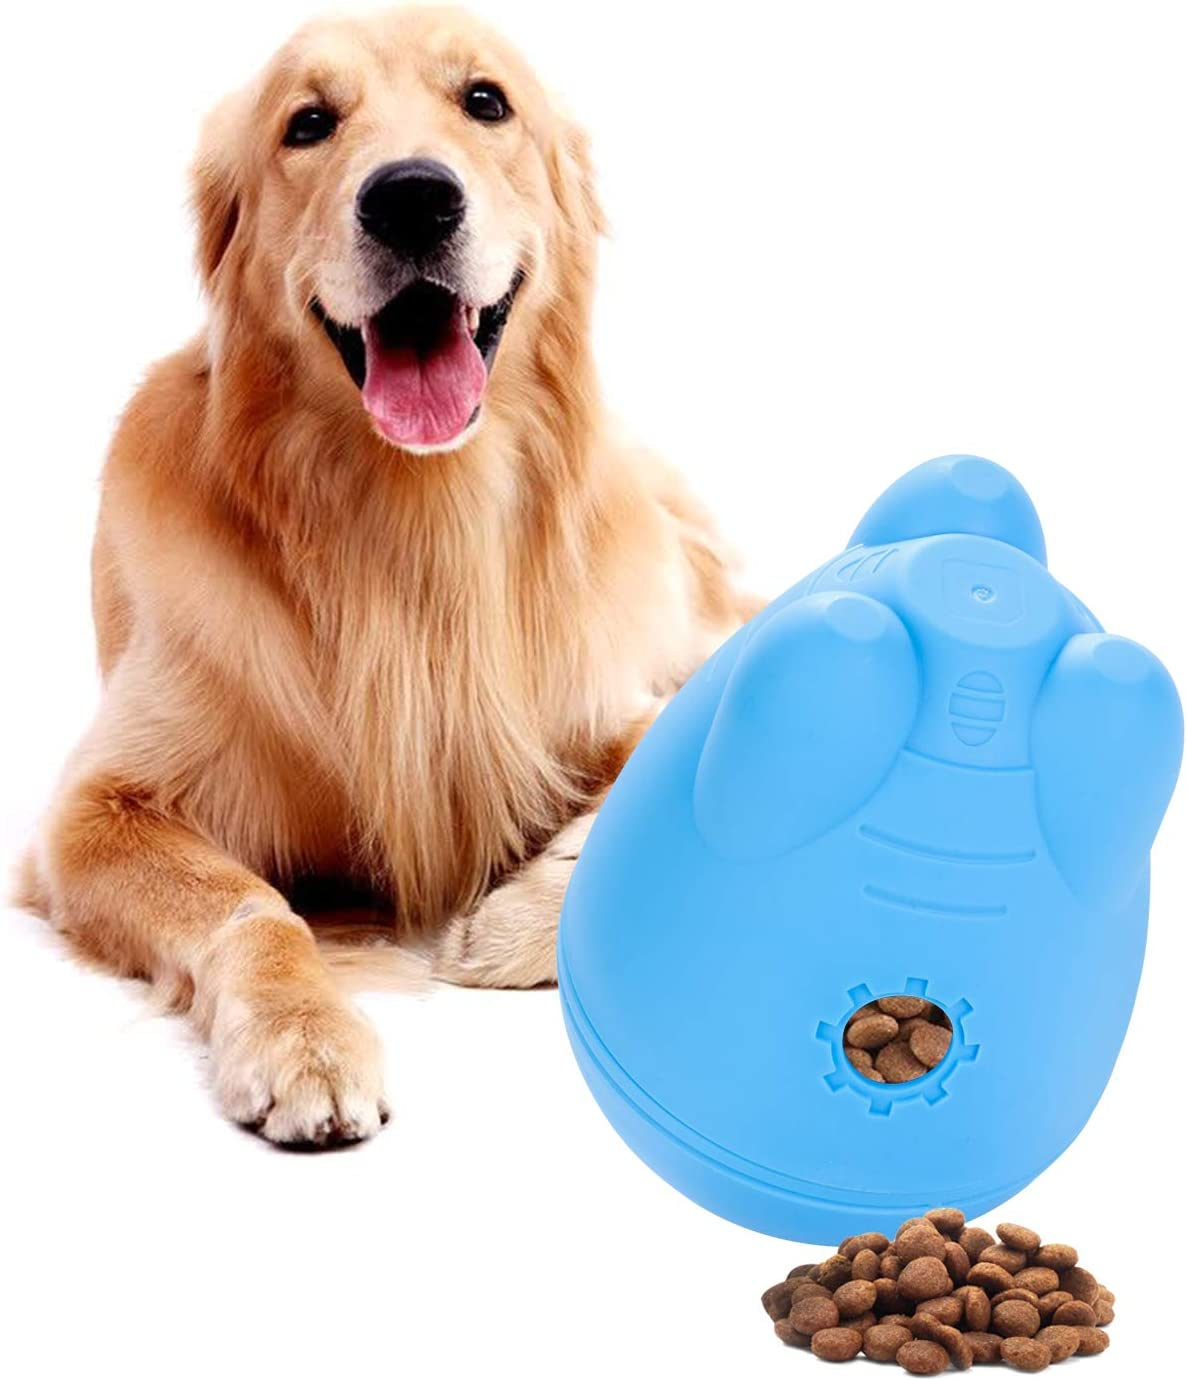 DYJKOUG Dog Treat Dispensing Ball Toys, Pet Dog Wobble Ball Slow Feeder Interactive Toy Detachable IQ Teat Ball Tumbler Toy for Dogs Food Dispenser (Blue)